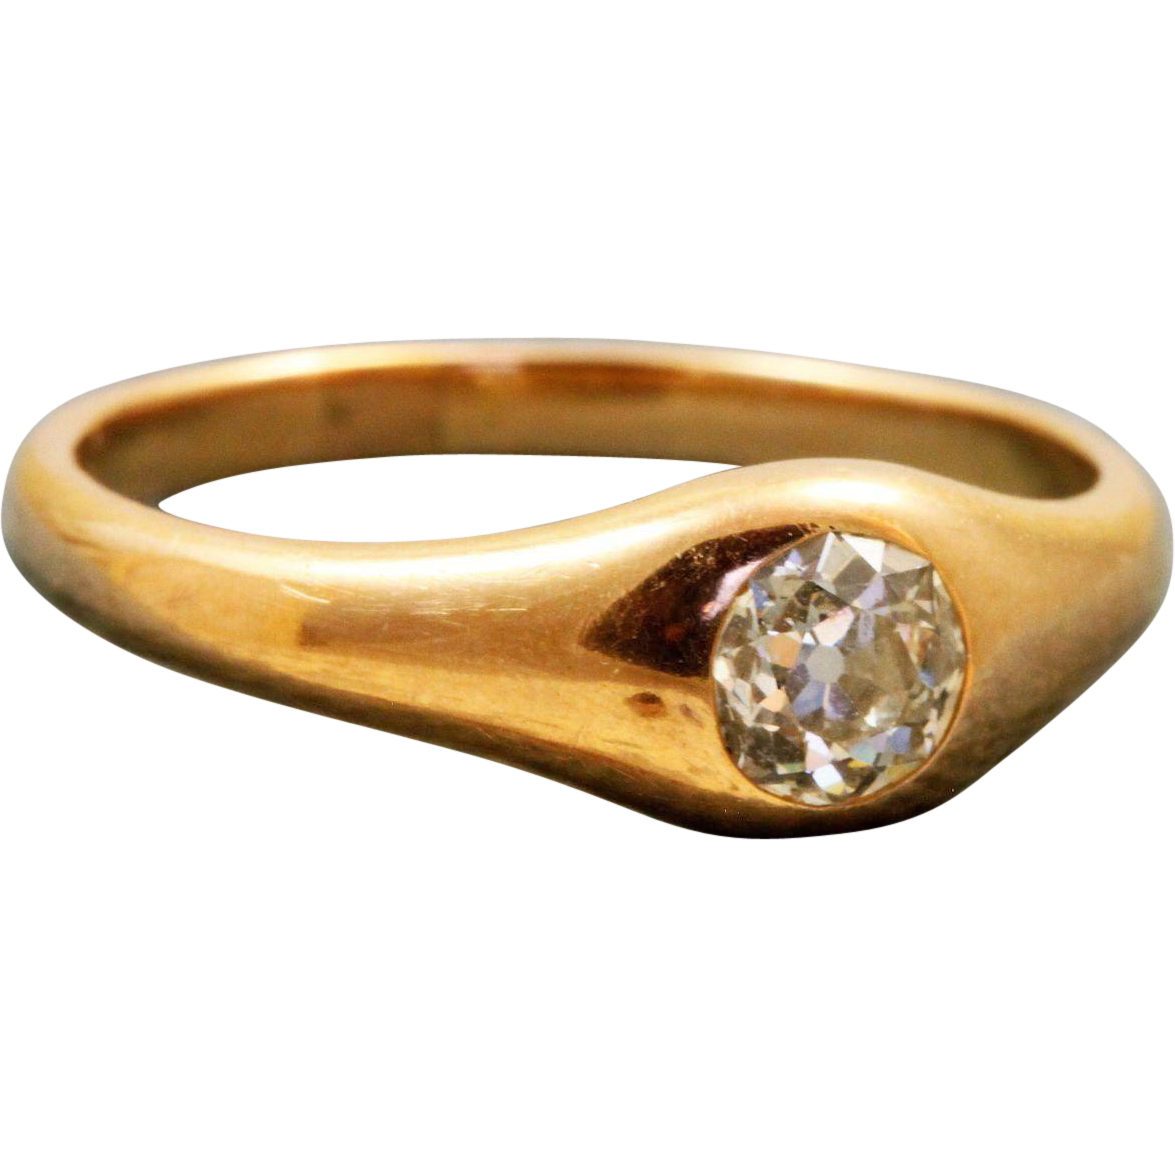 Estate 18 K Tiffany & Co Old European Cut Diamond Ring